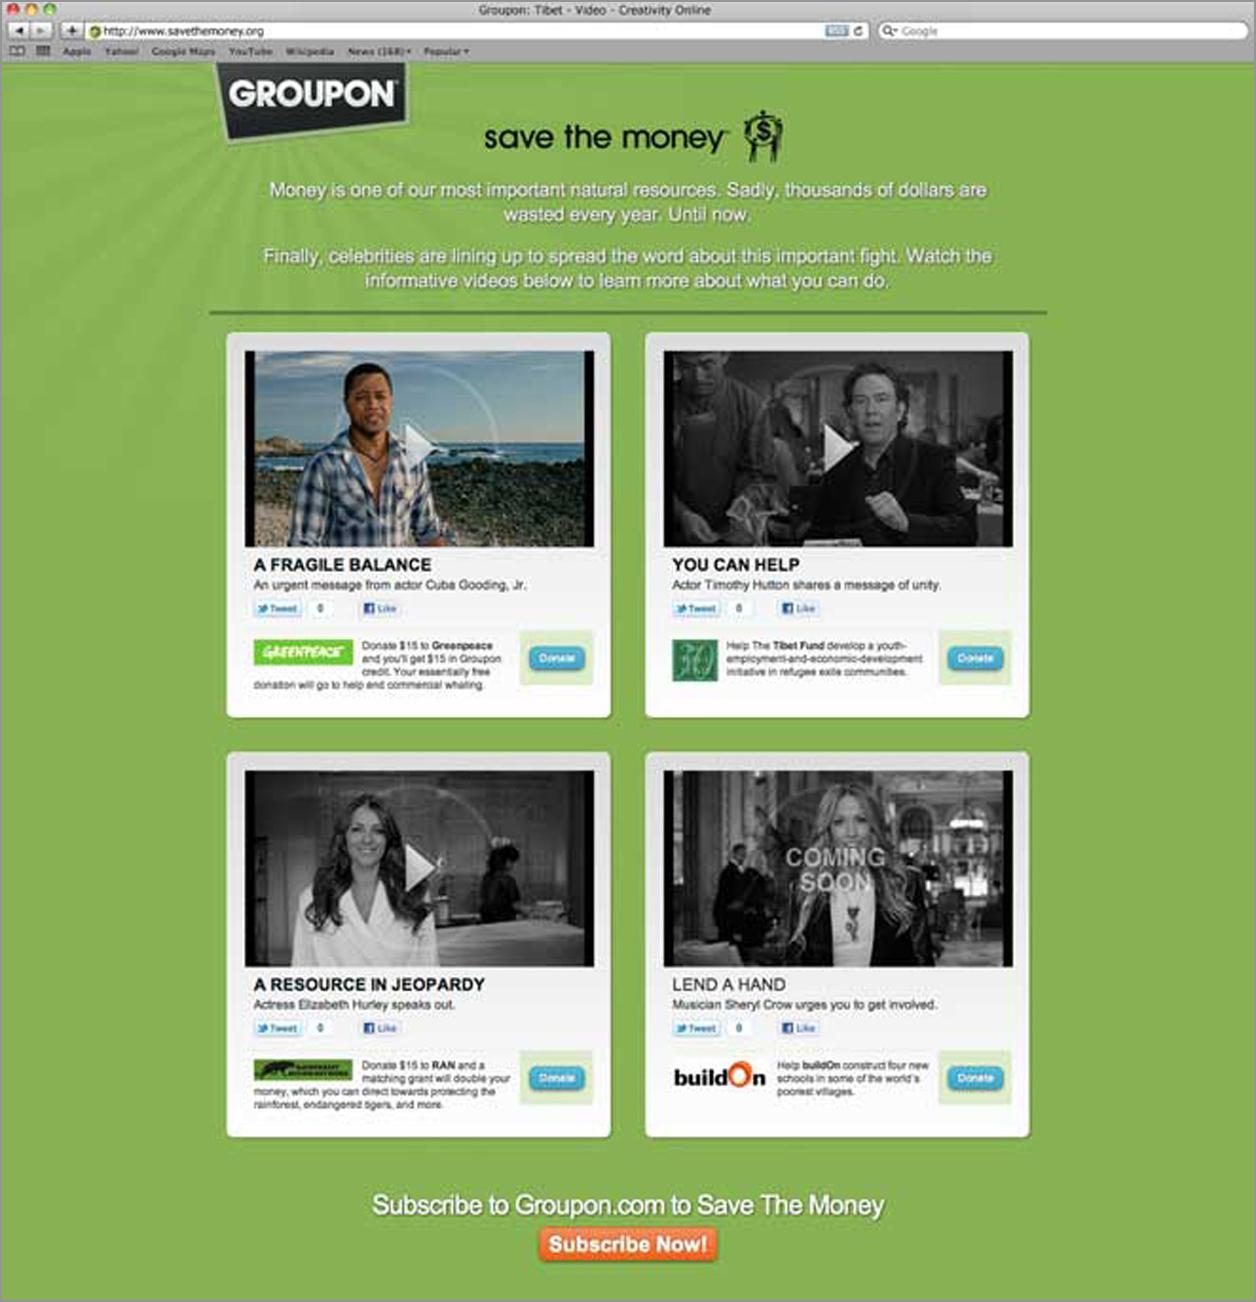 groupon_save_the_money copy_o.jpg